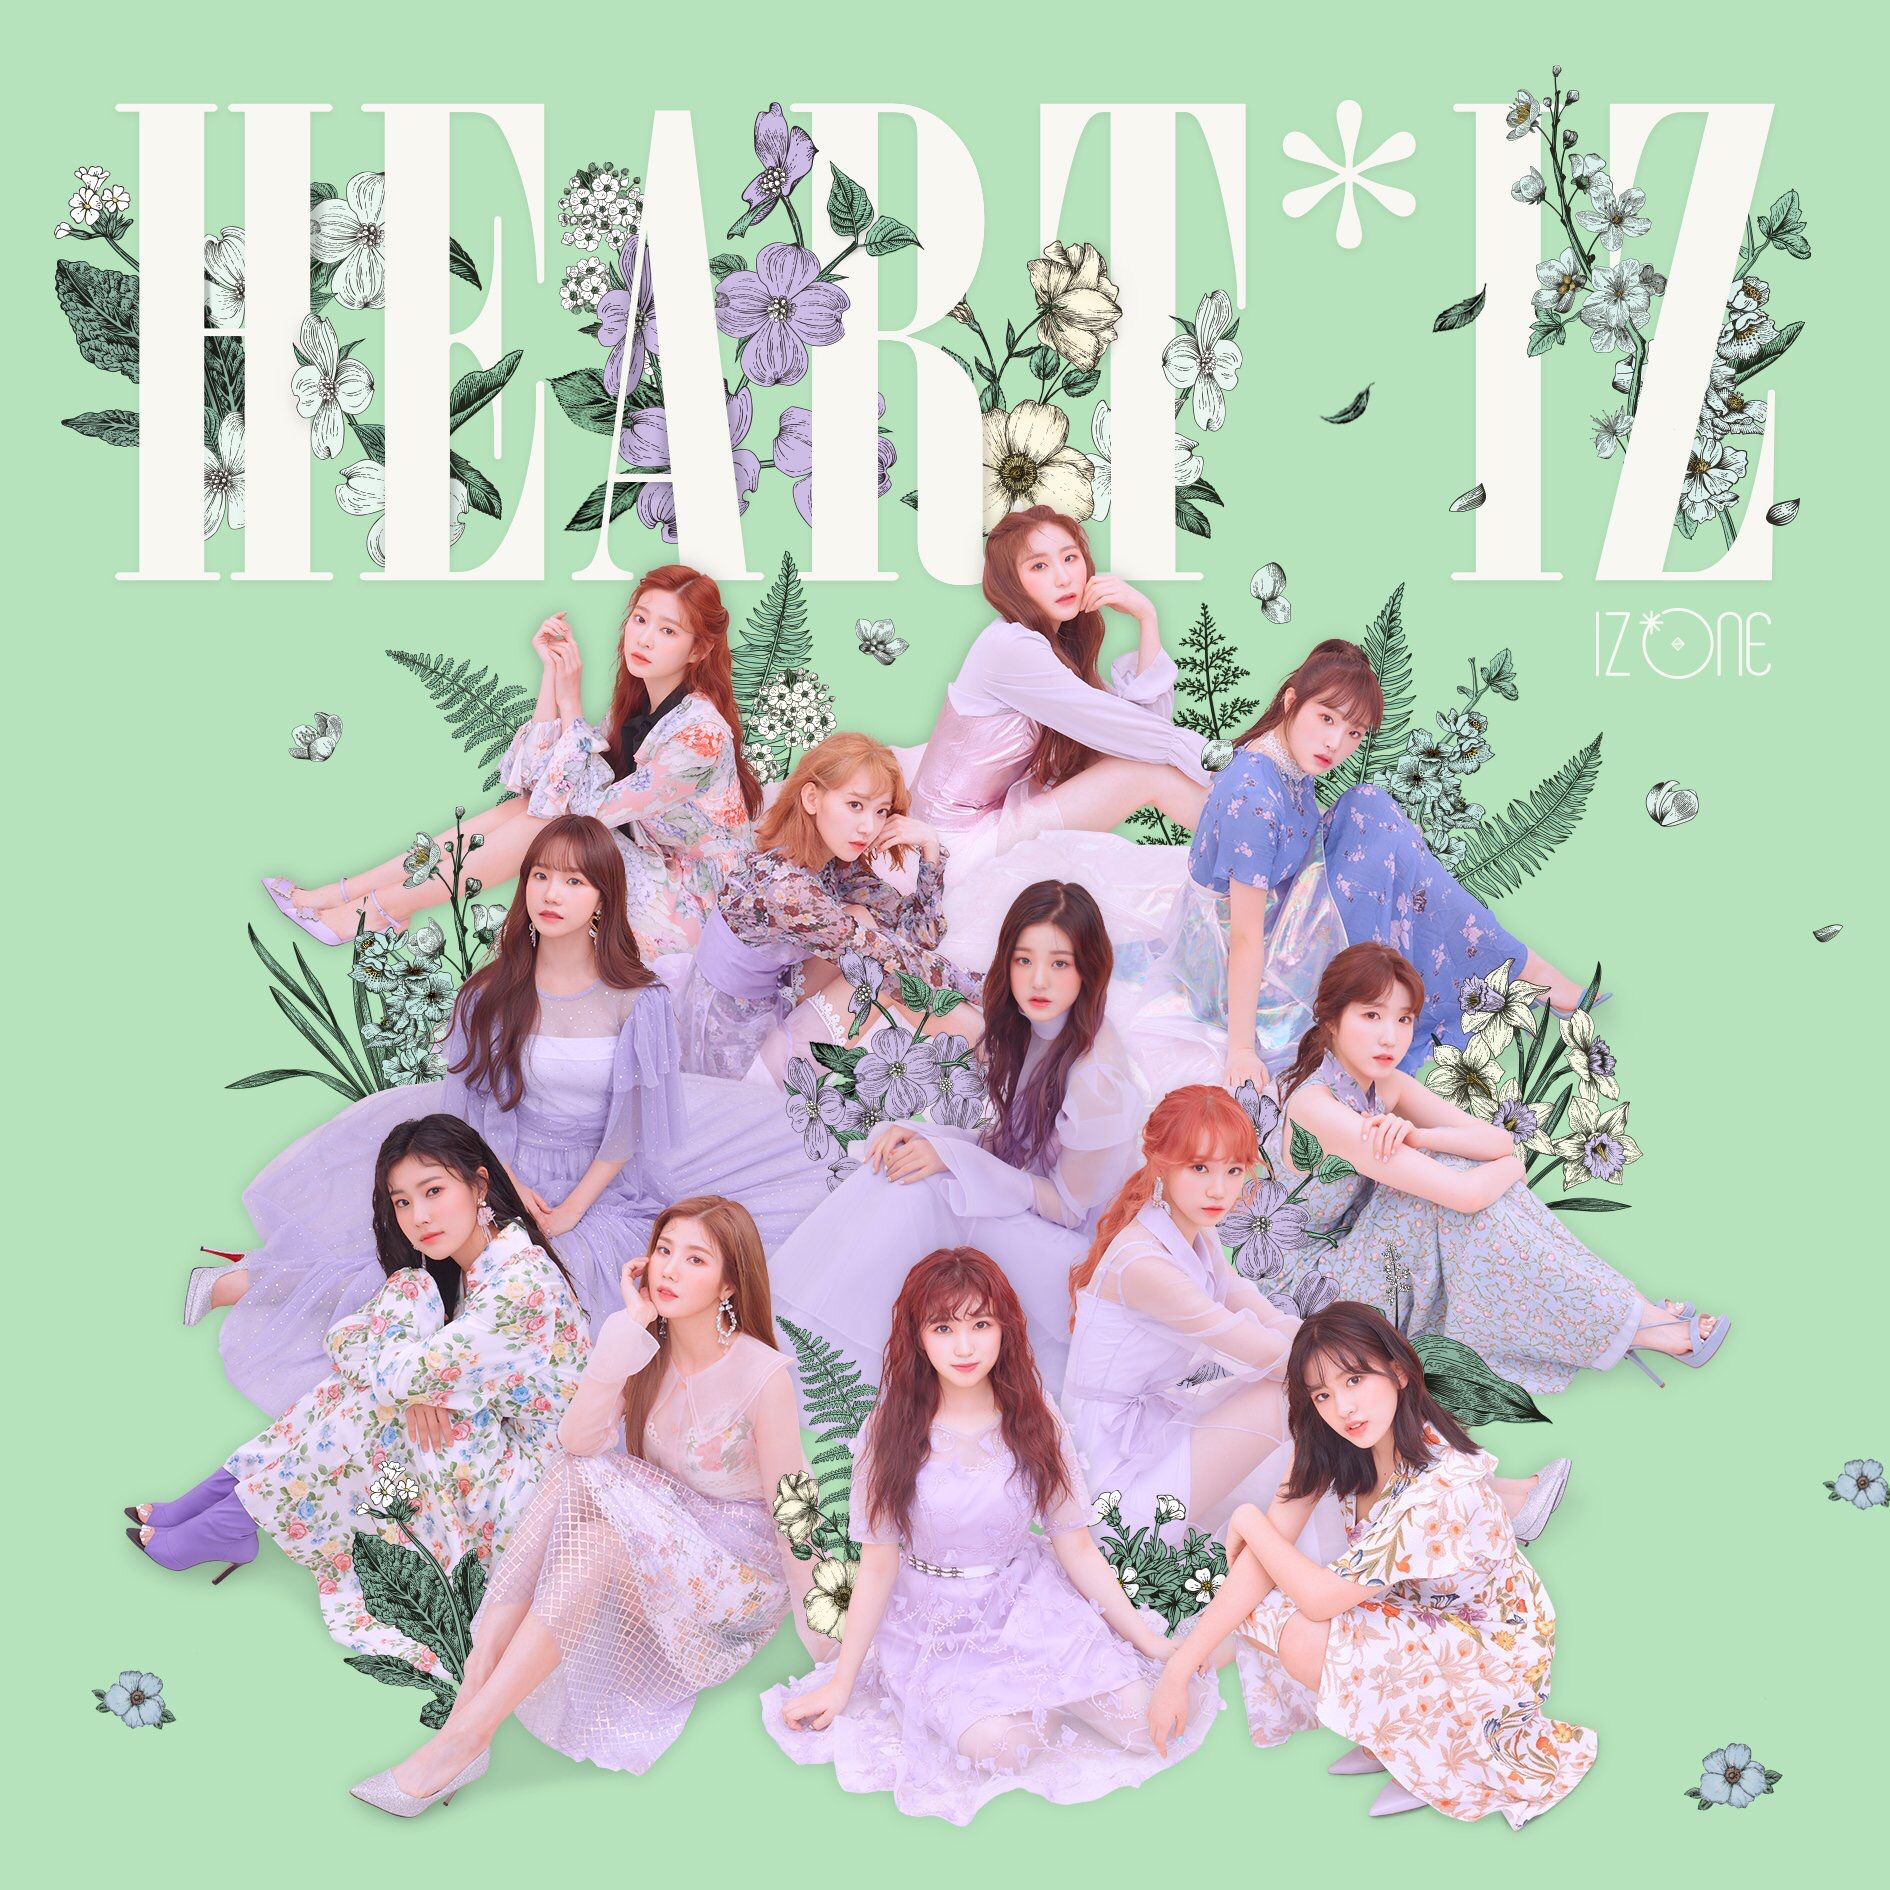 IZONE (#아이즈원) - 2nd Mini Album [HEART*IZ] COVER IMAGE